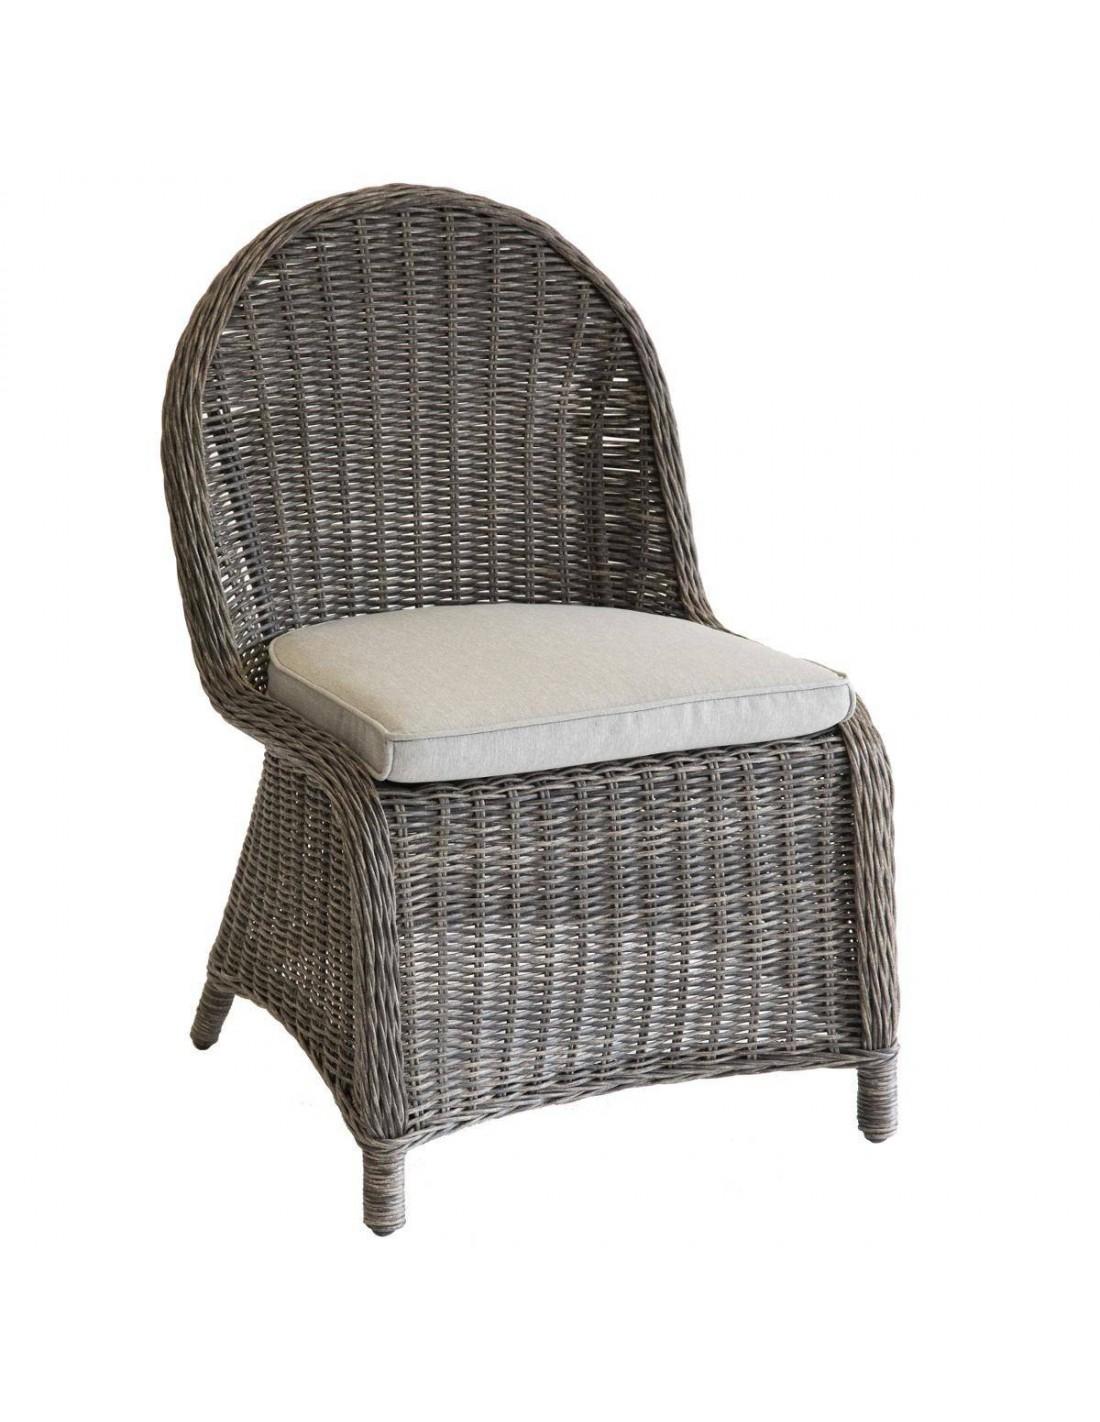 Chaise De Jardin Bétong - Aluminium En Résine Tressée - Hespéride à Chaise De Jardin Hesperide